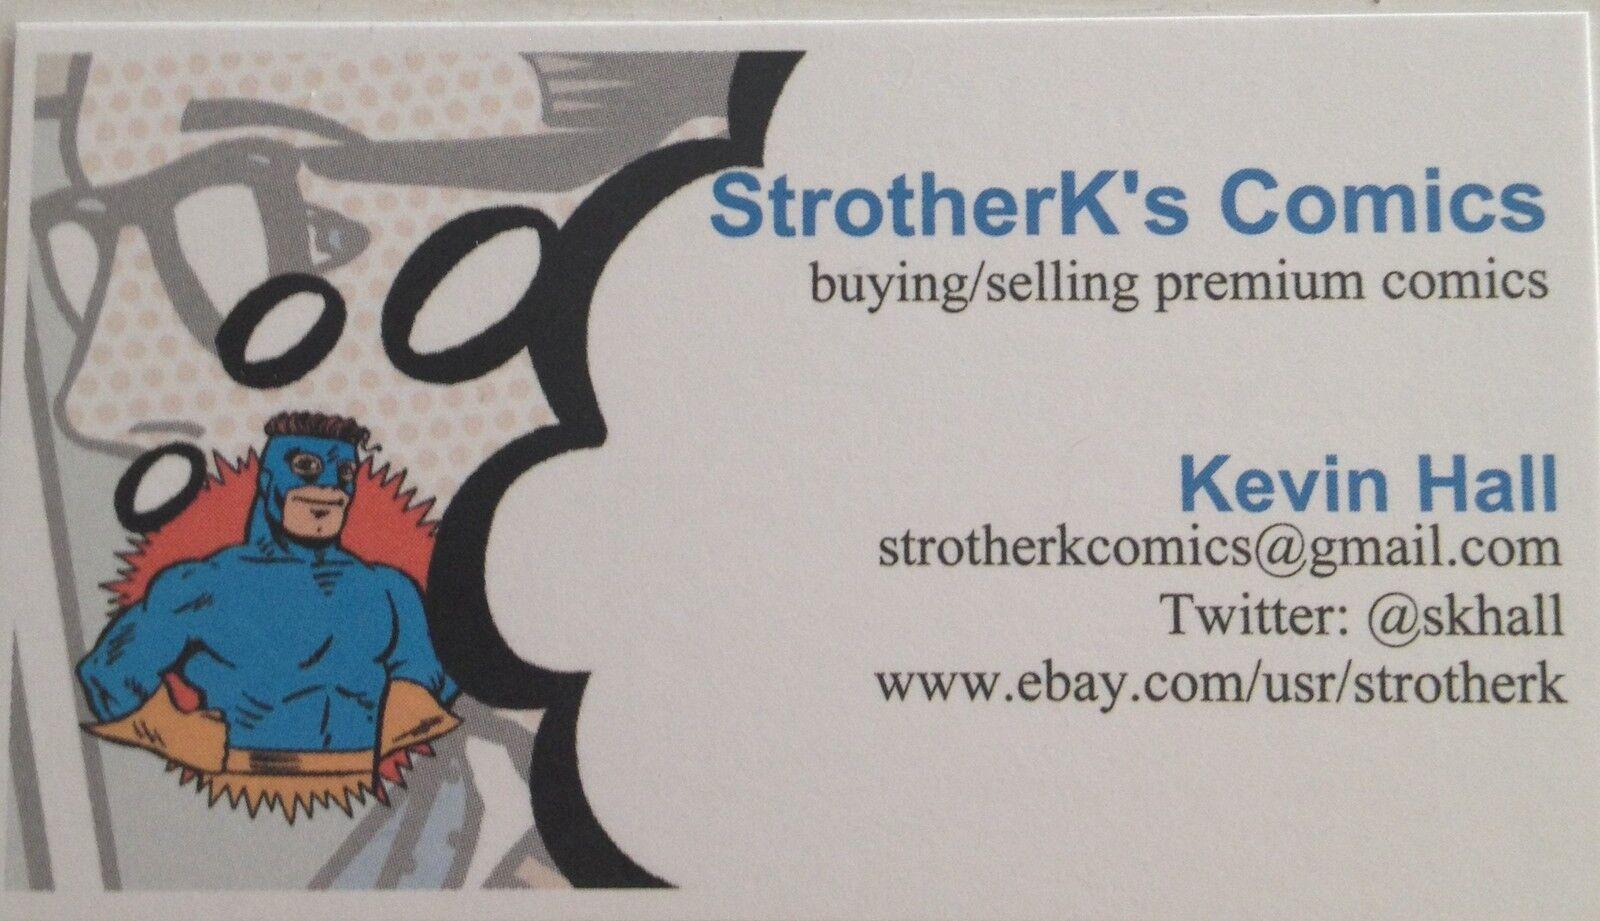 StrotherK s Comics